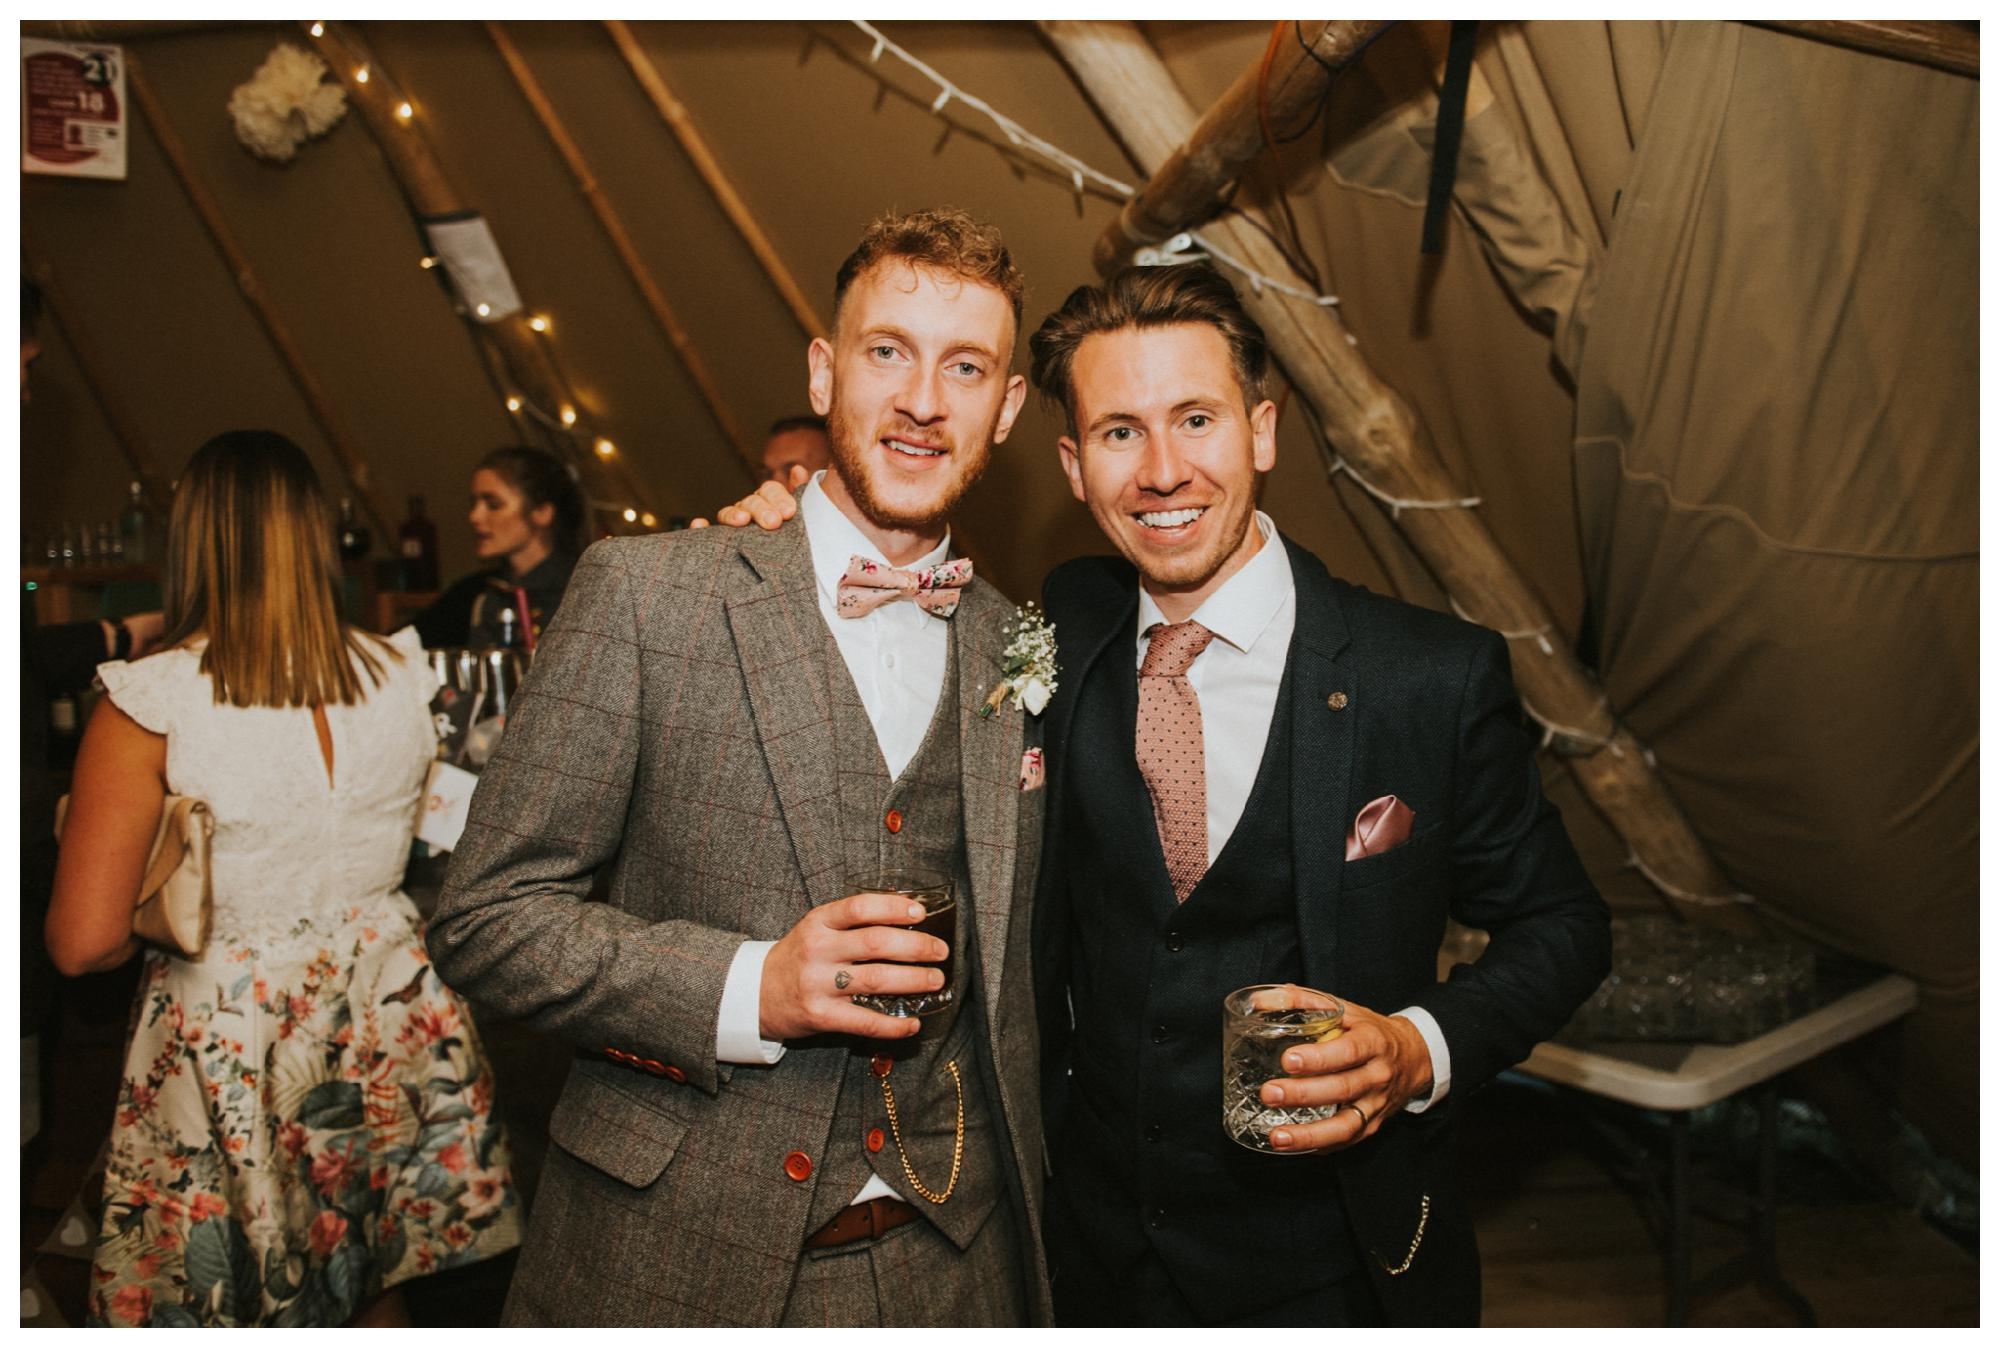 InkersgallGrangeFarm-LukeHolroyd-Yorkshirewedding_0146.jpg